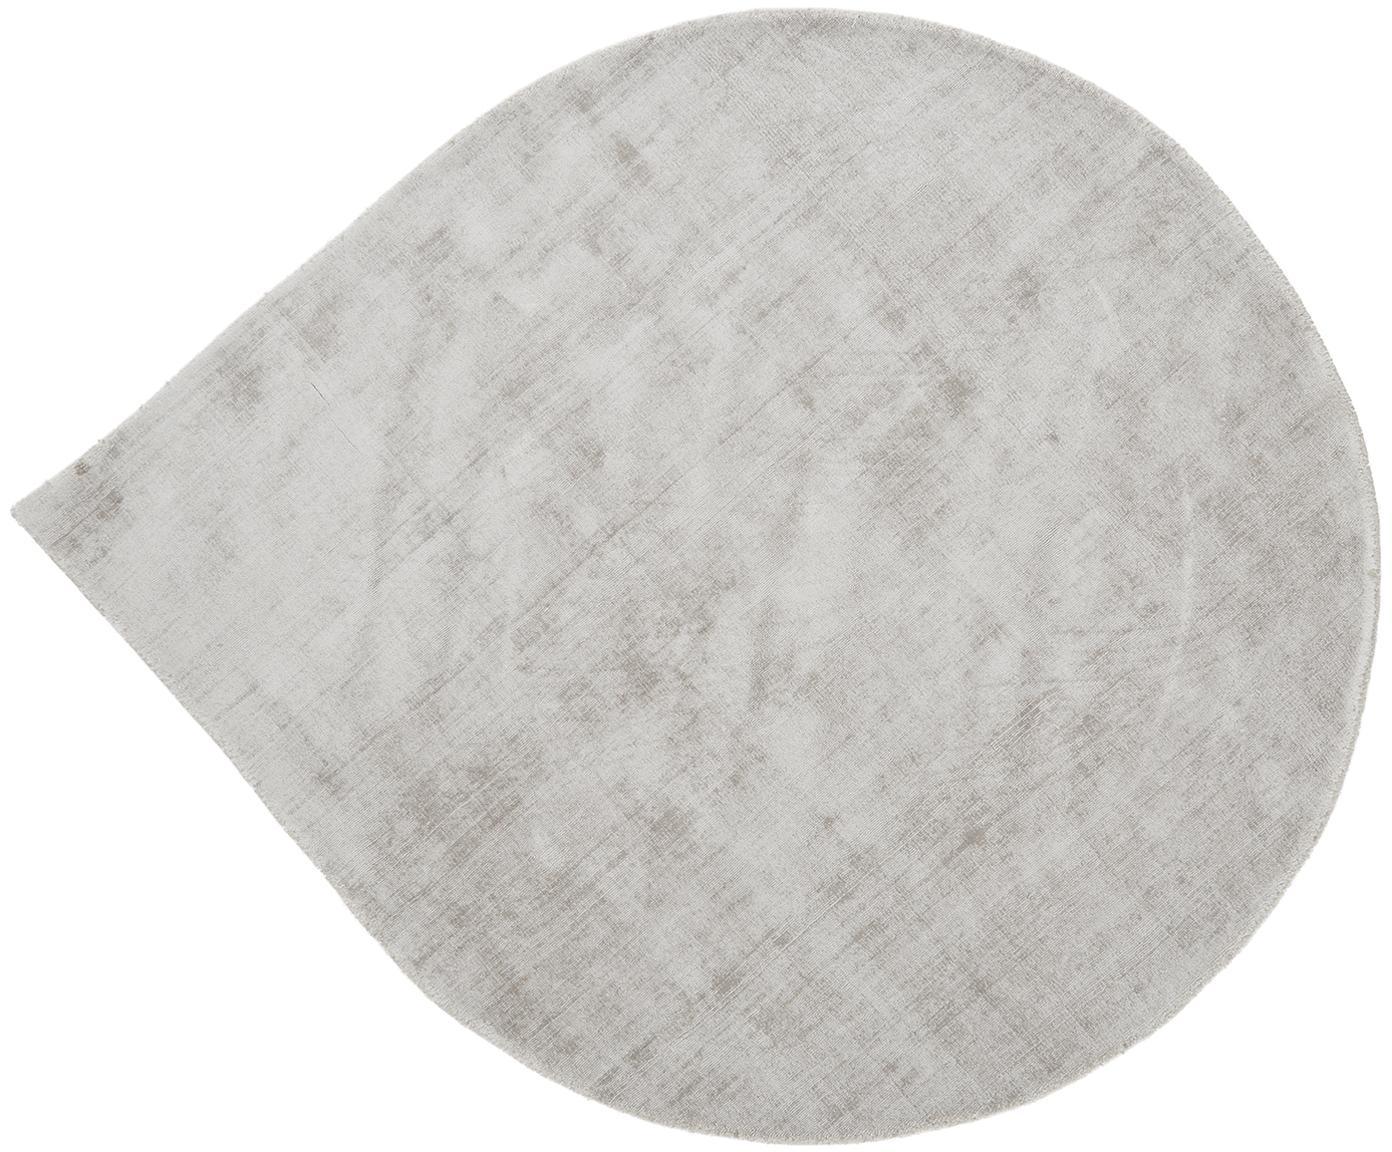 Alfombra artesanal de viscosa Jane Drop, Parte superior: 100%viscosa, Reverso: 100%algodón, Gris claro, beige, Ø 150 cm (Tamaño M)